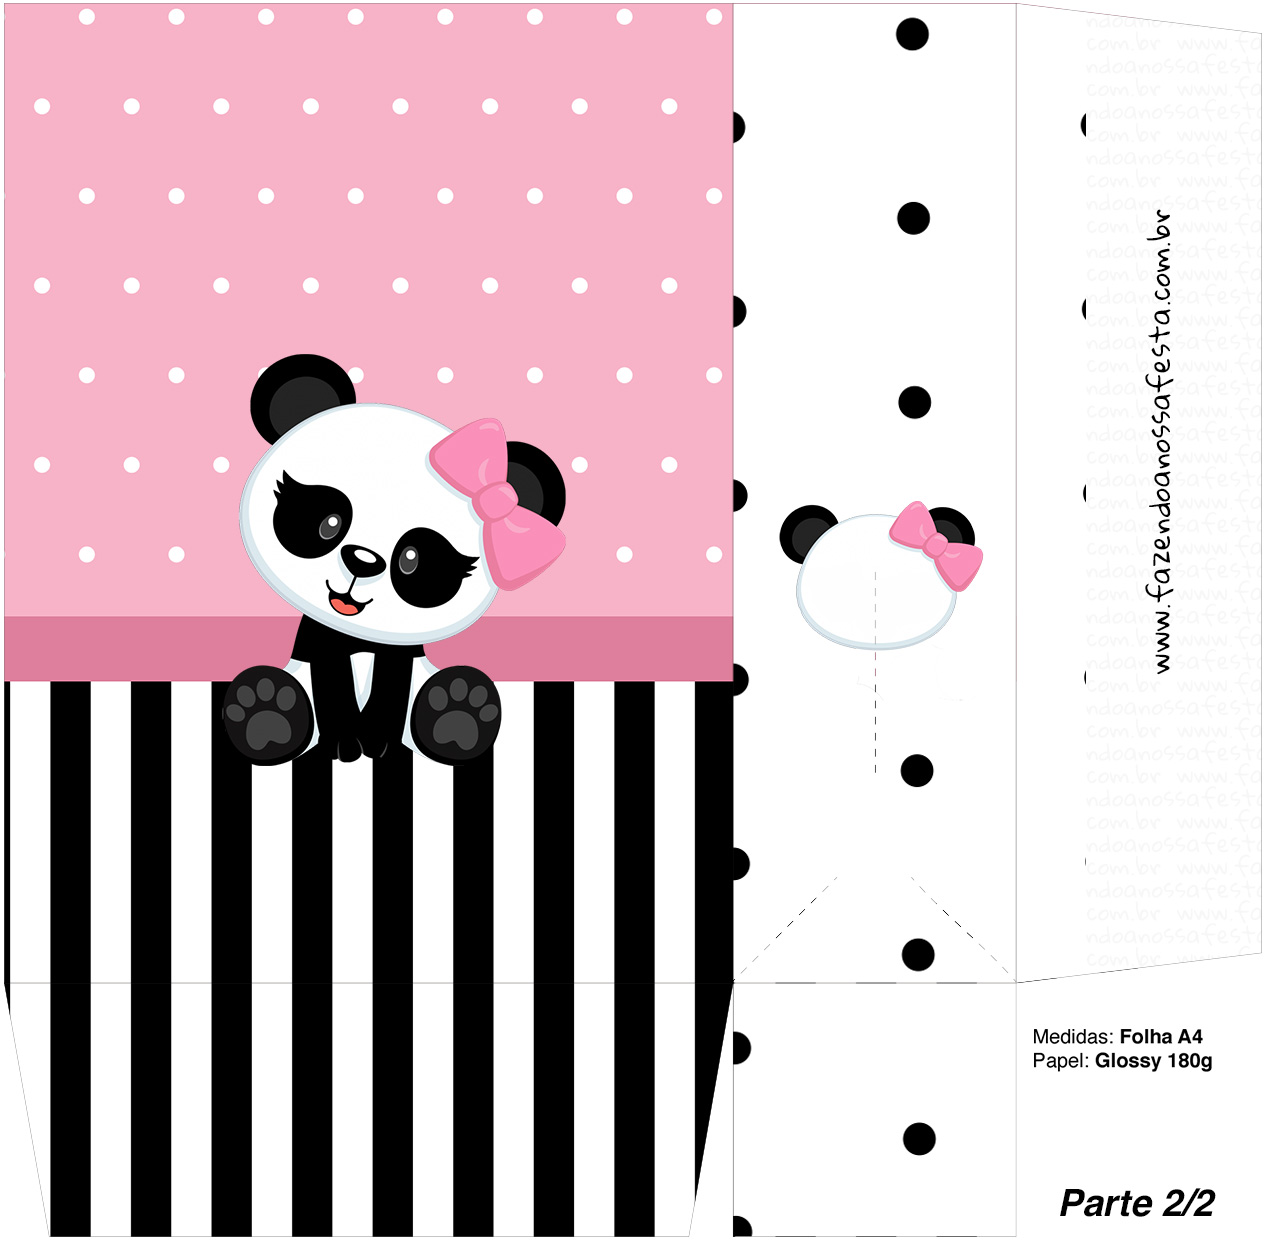 Sacolinha Surpresa 2 2 Panda Rosa Kit Festa